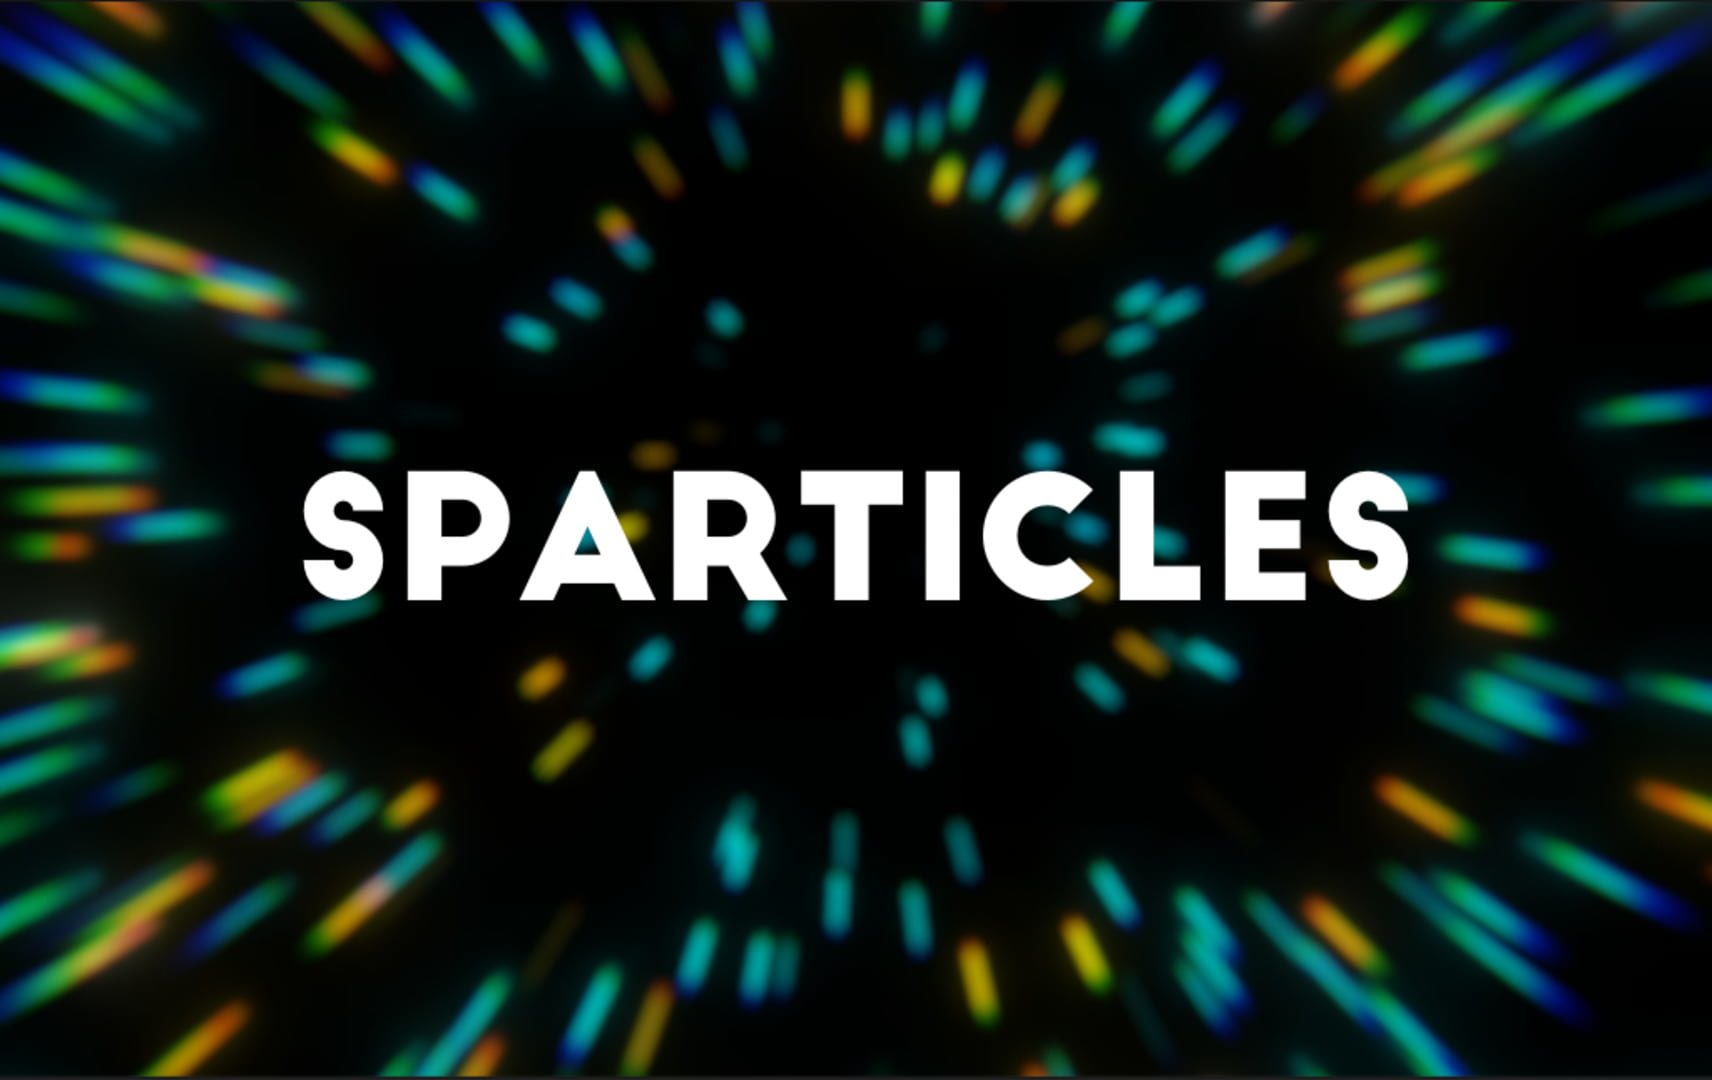 buy Sparticles cd key for all platform